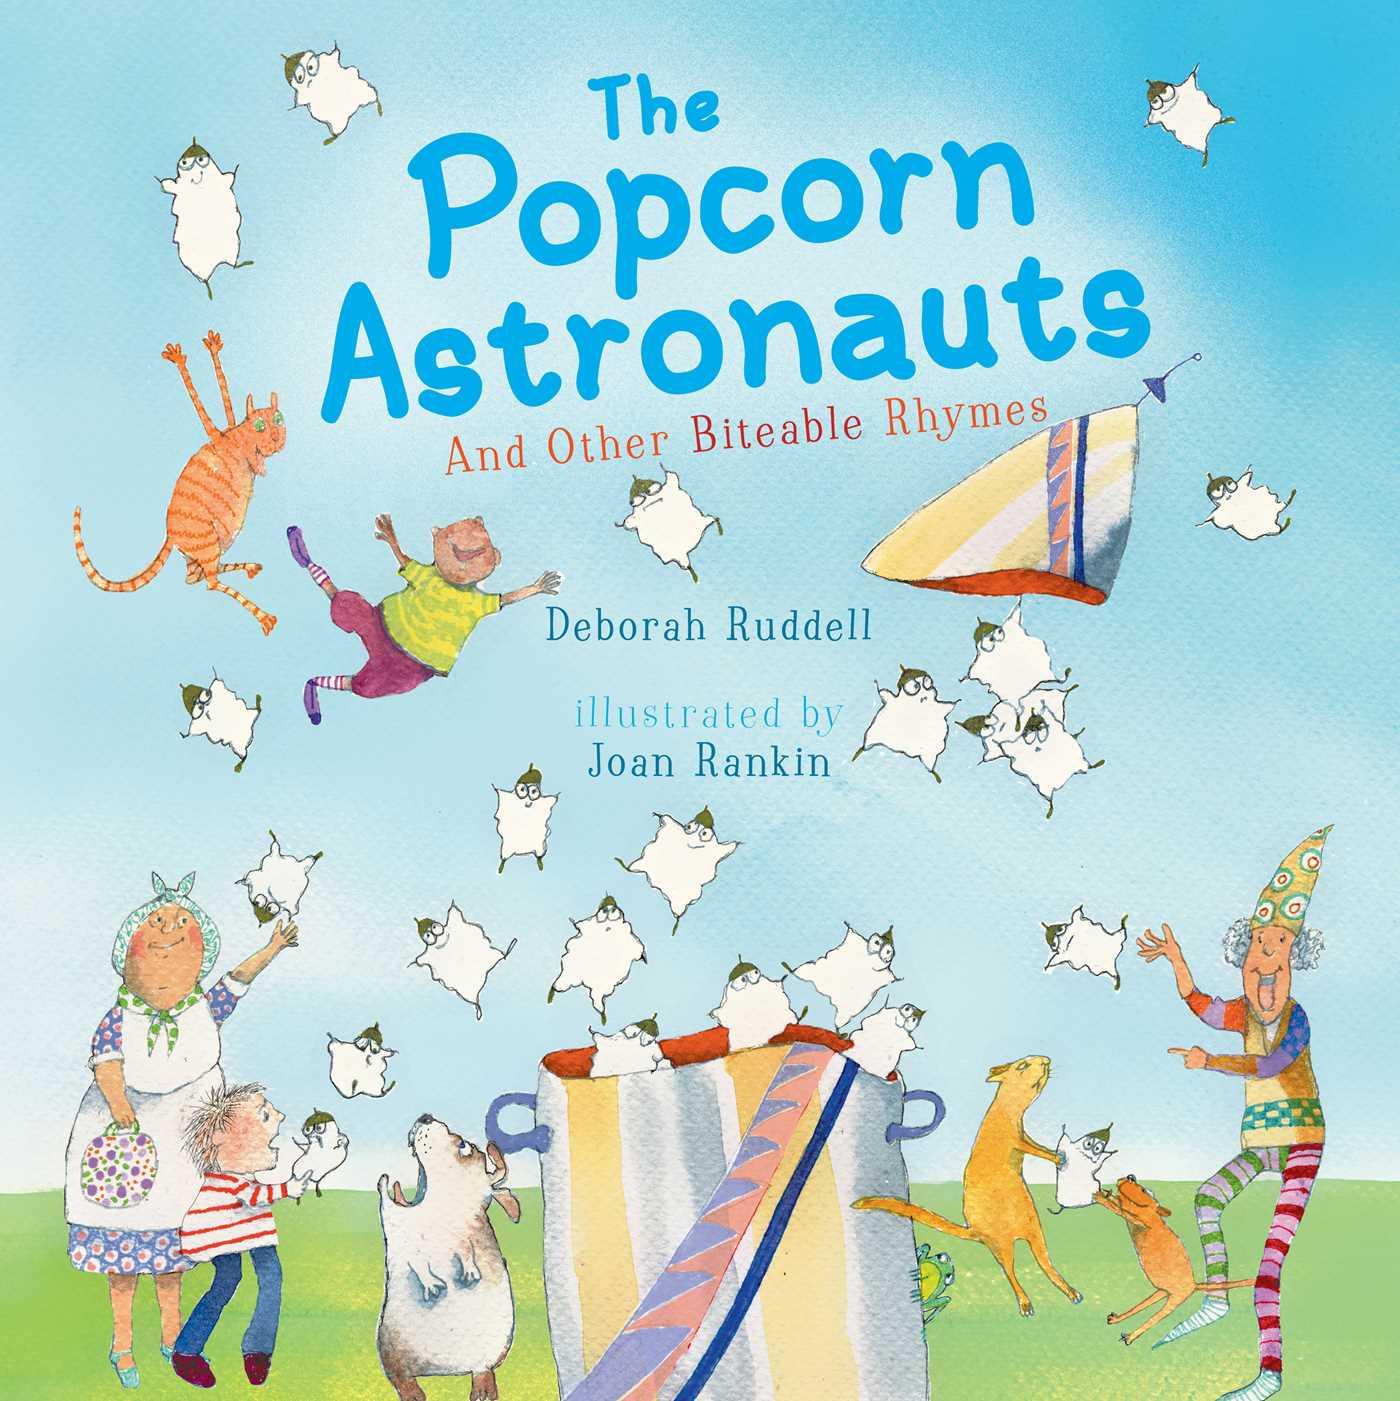 The popcorn astronauts 9781442465558 hr